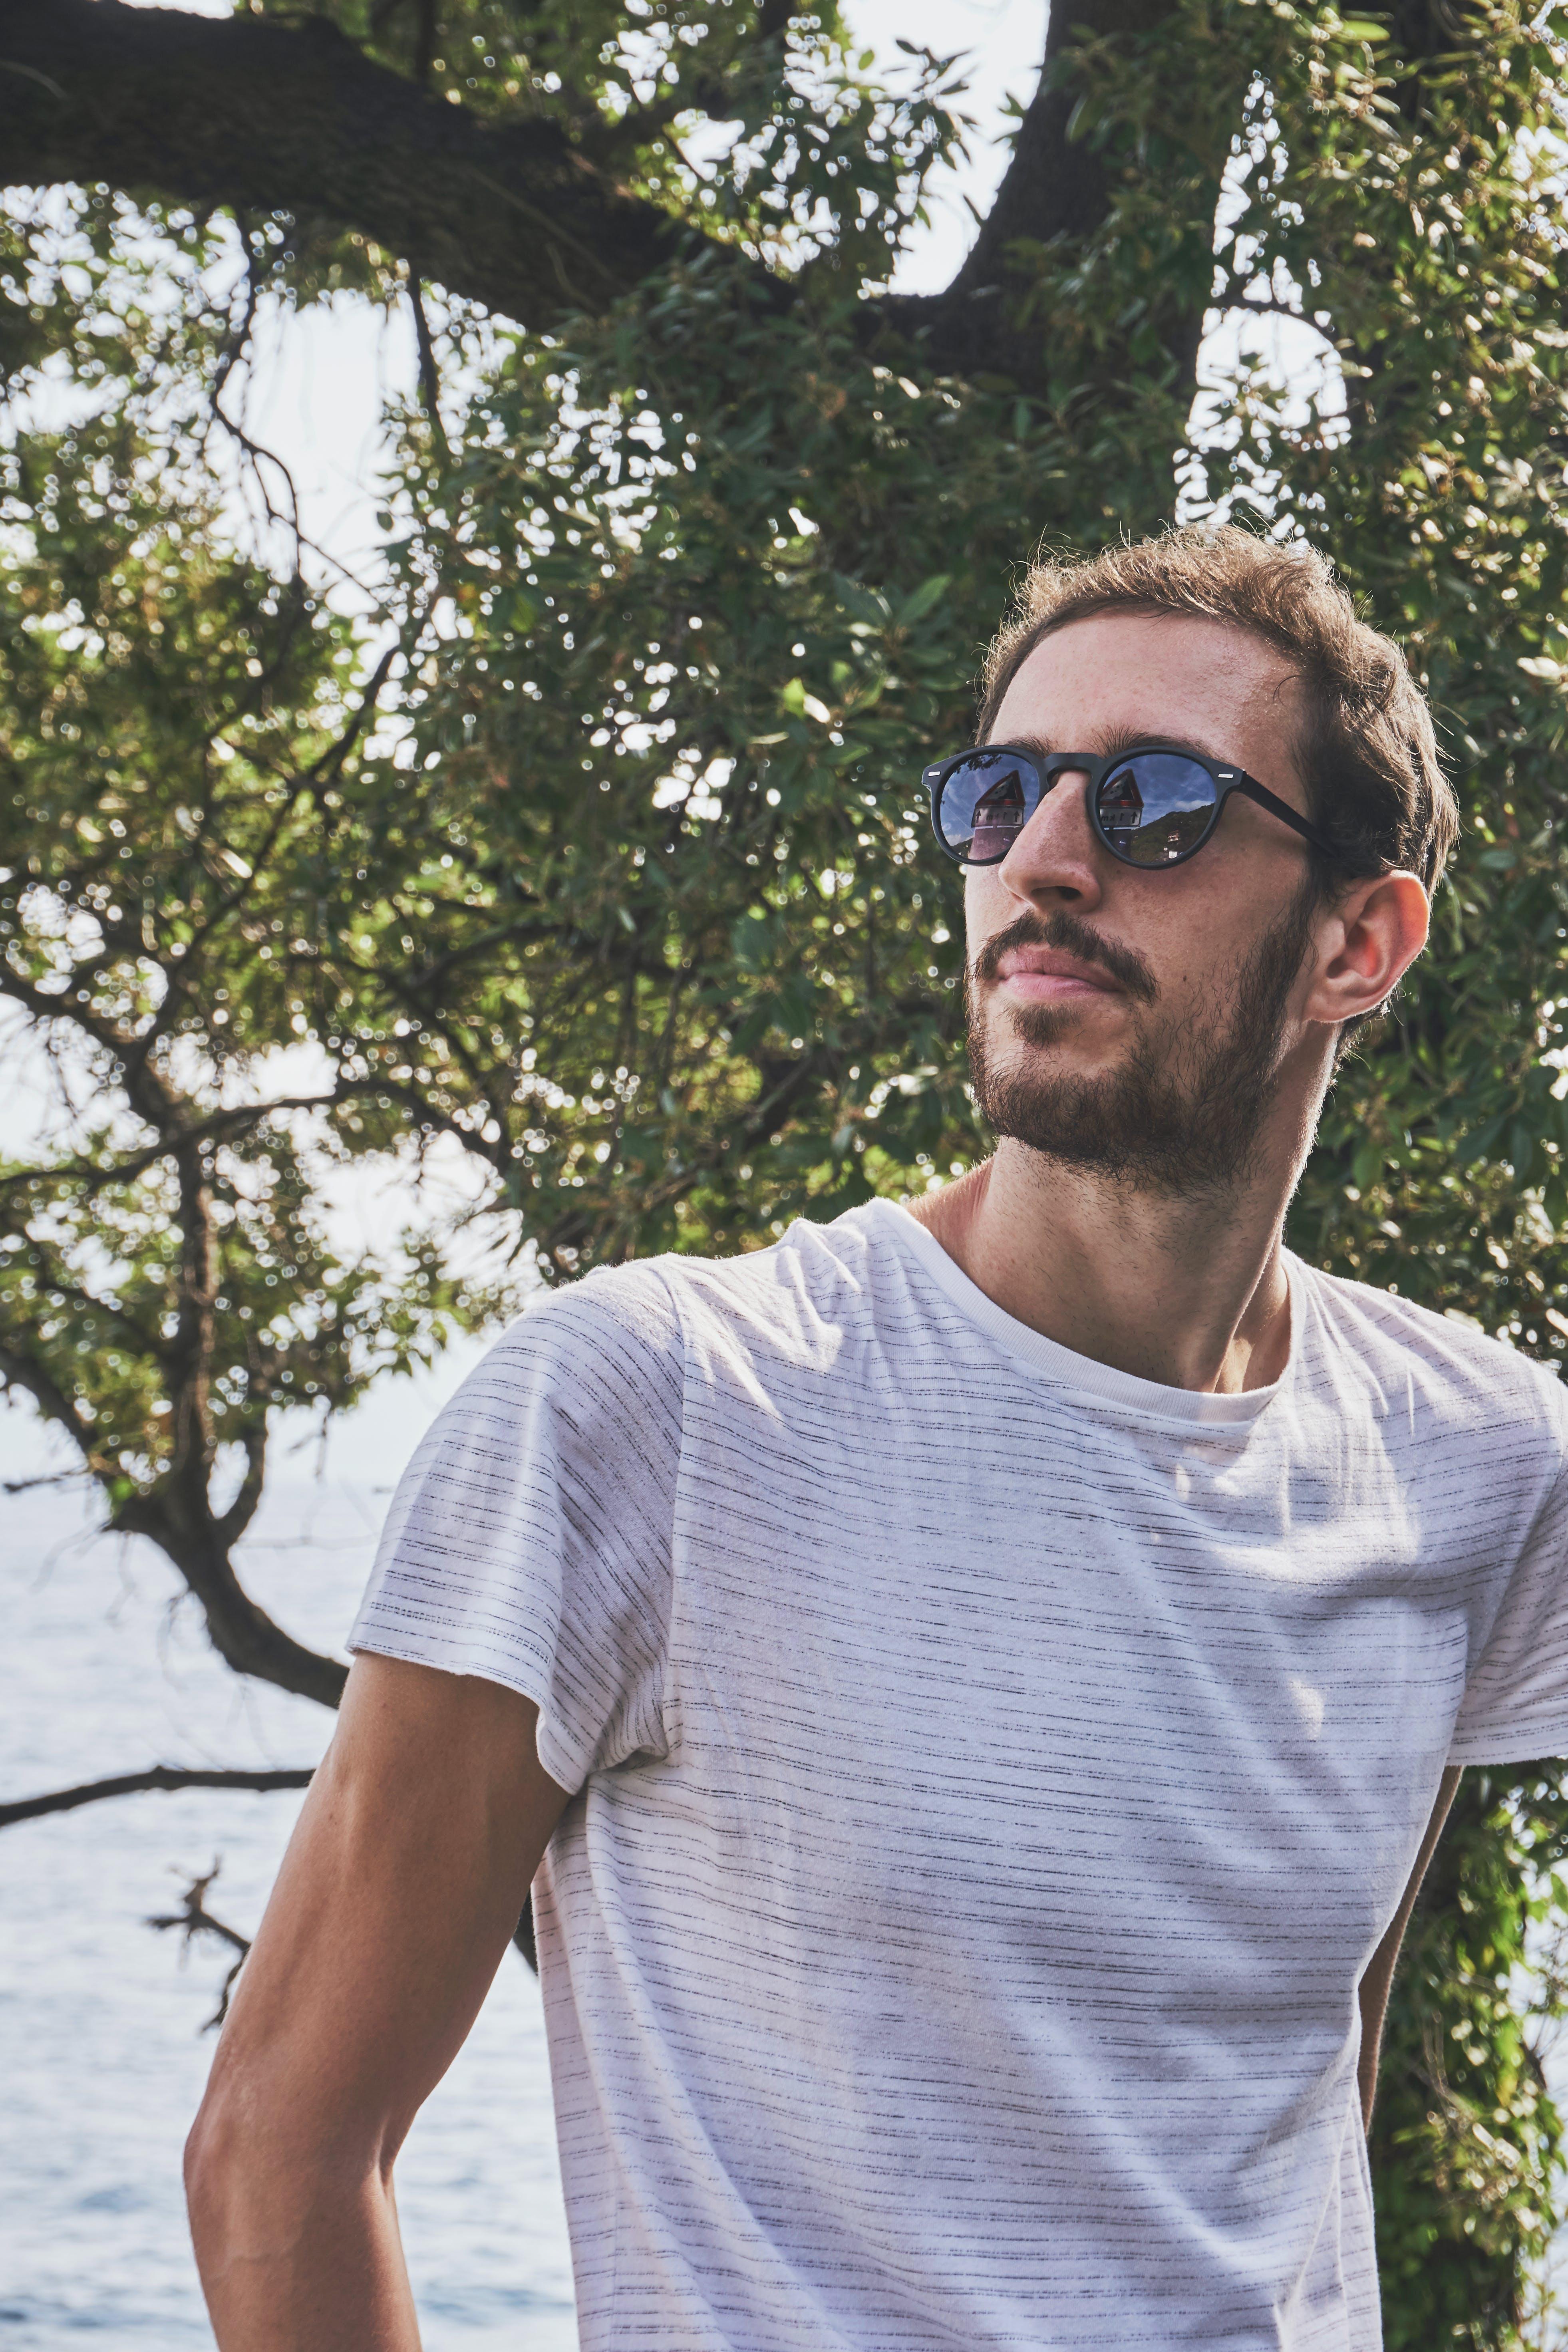 Man Wearing White Crew-neck T-shirt And Sunglasses